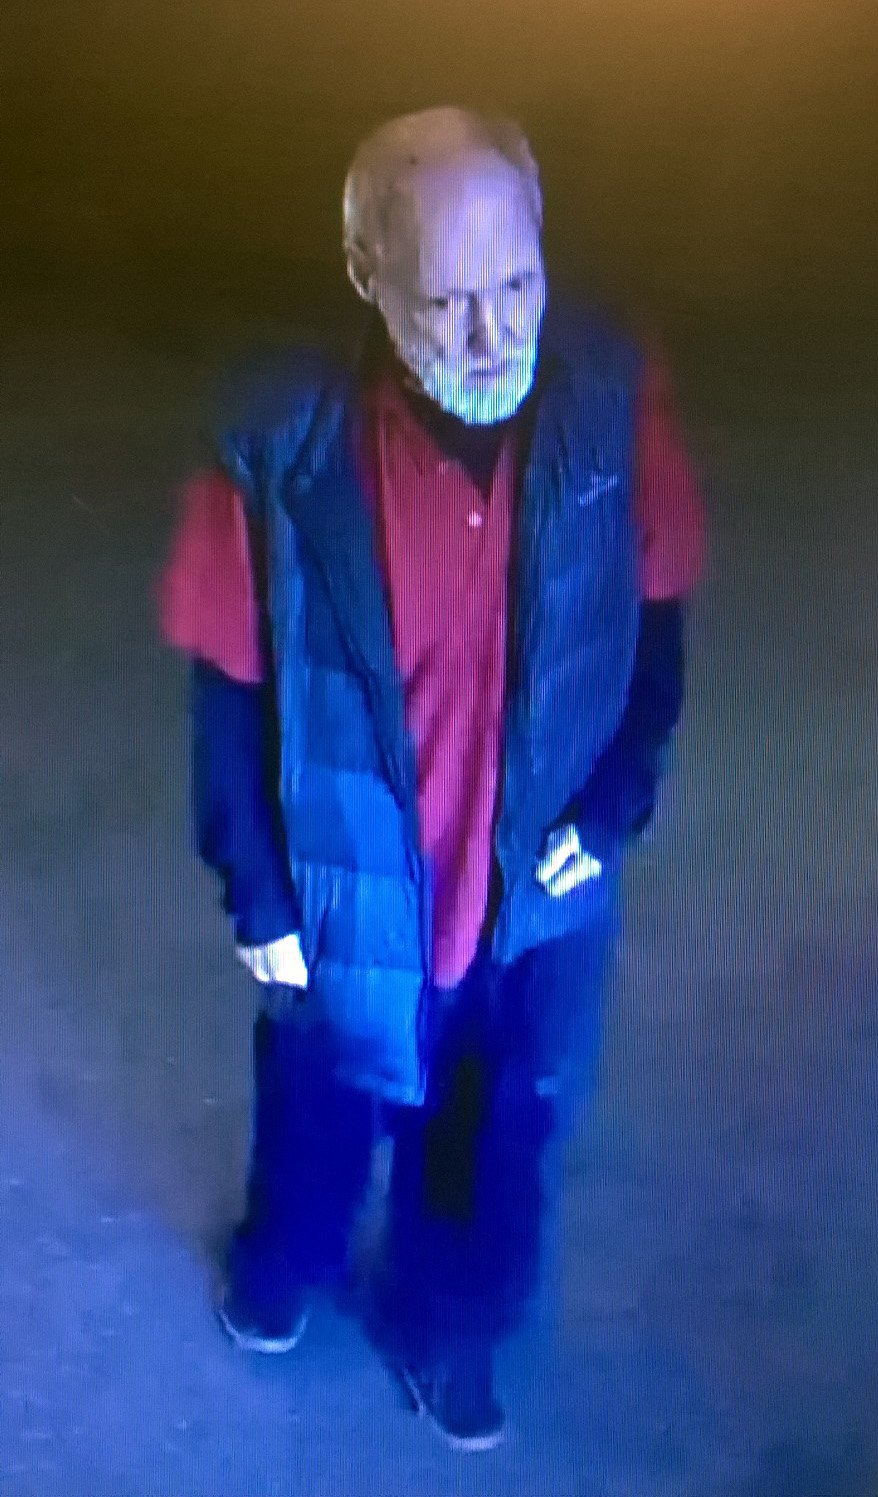 A CCTV image of Gordon Mclean